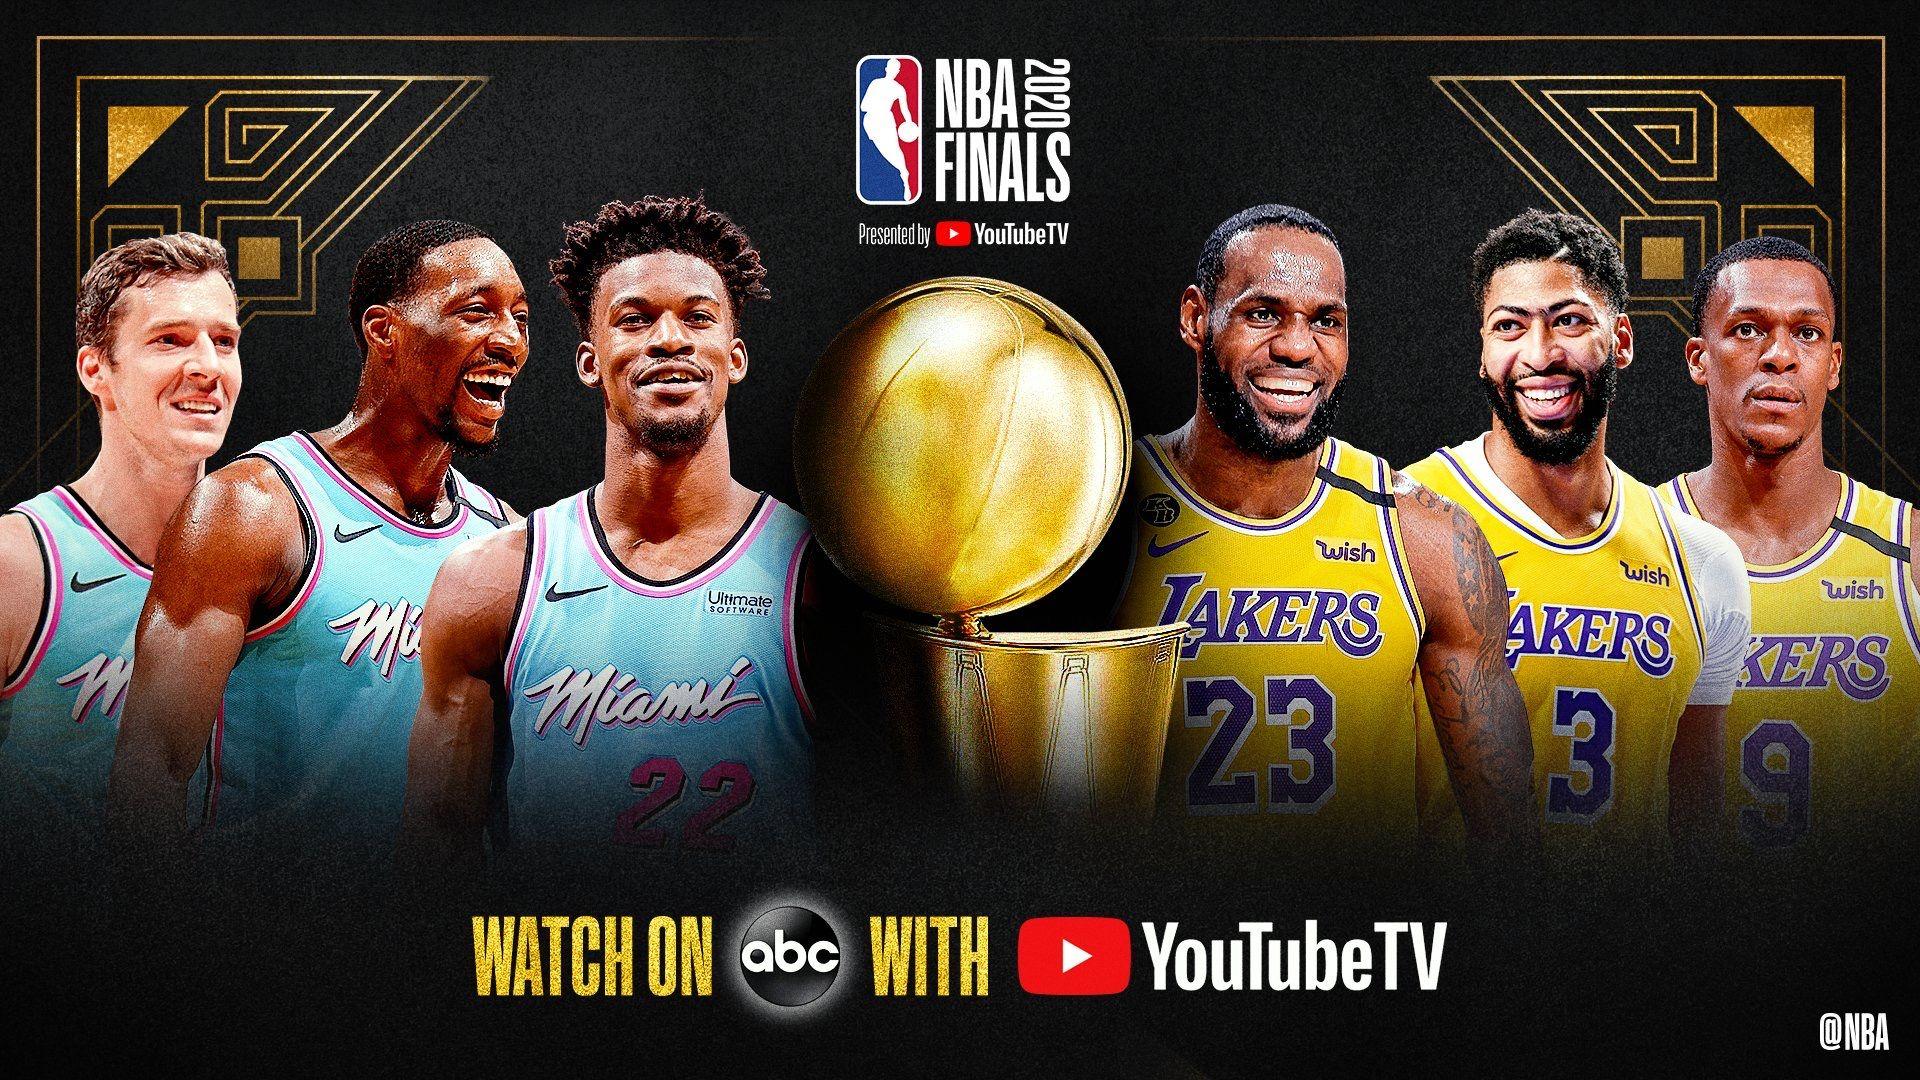 NBA总决赛湖人大战热火,这些故事你有必要了解图片